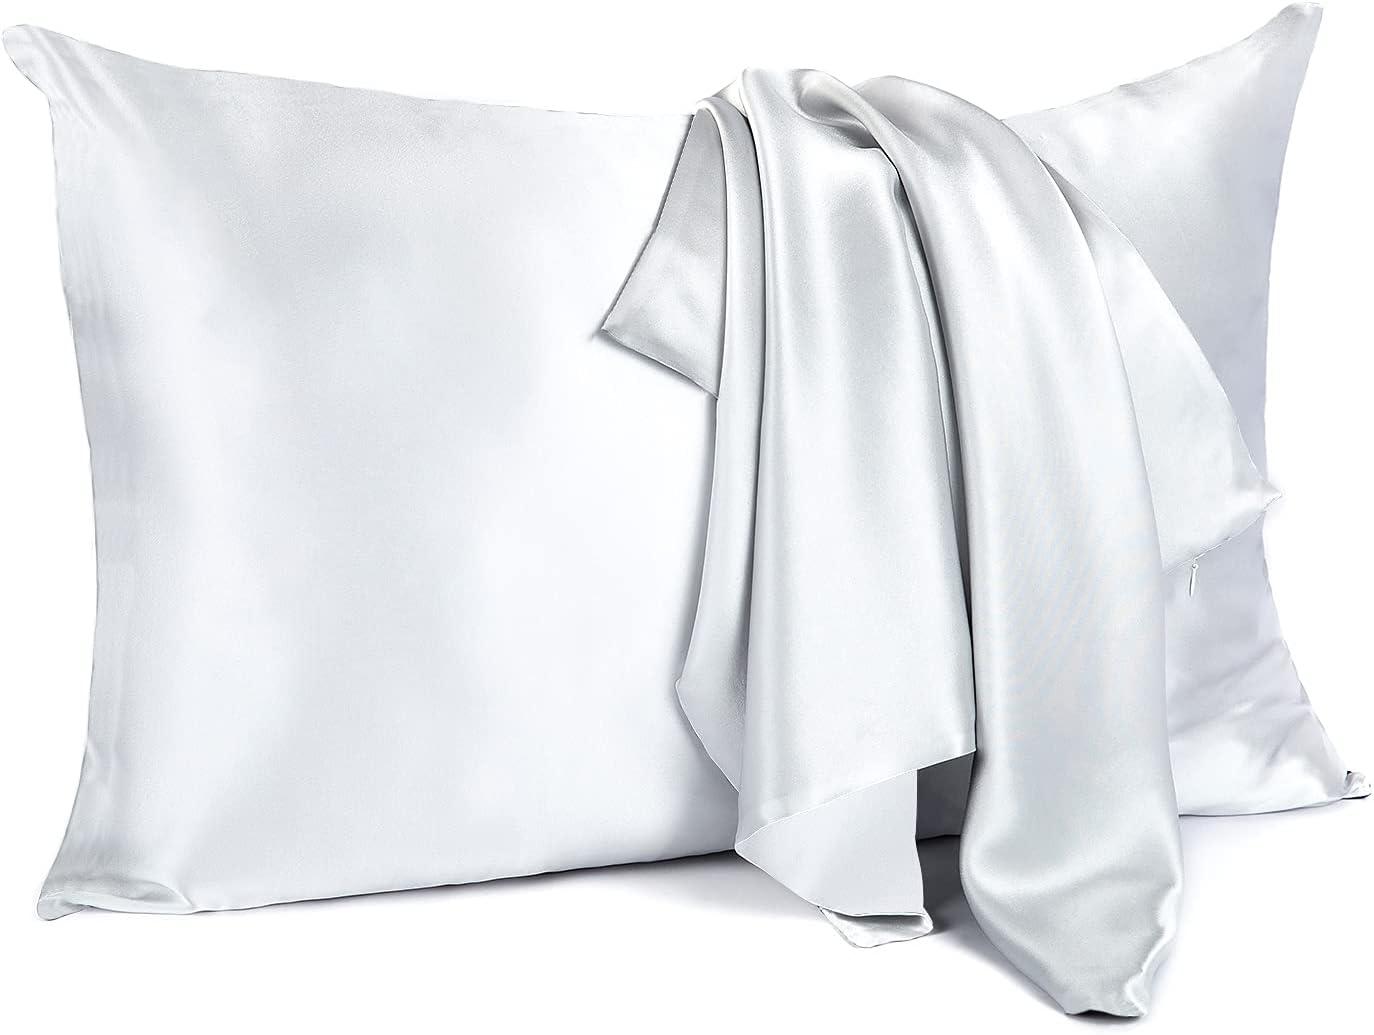 Popular brand MANSPHIL Silk Spring new work Pillowcase for Hair and Natural 100% Mulberr Skin